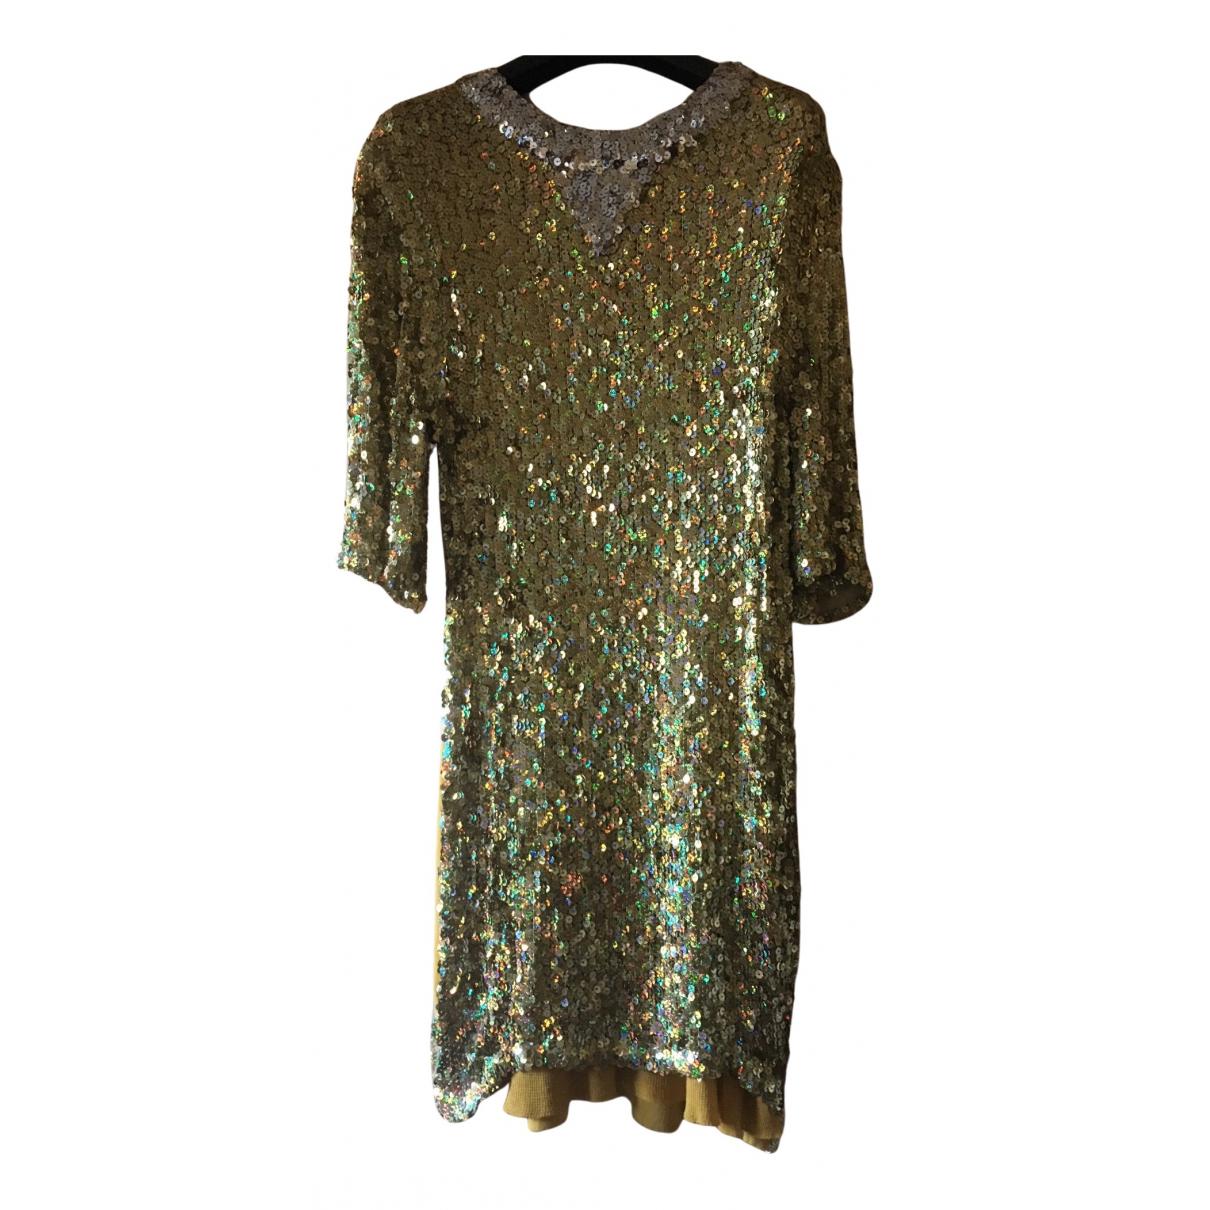 Sonia Rykiel N Gold Glitter dress for Women 42 FR